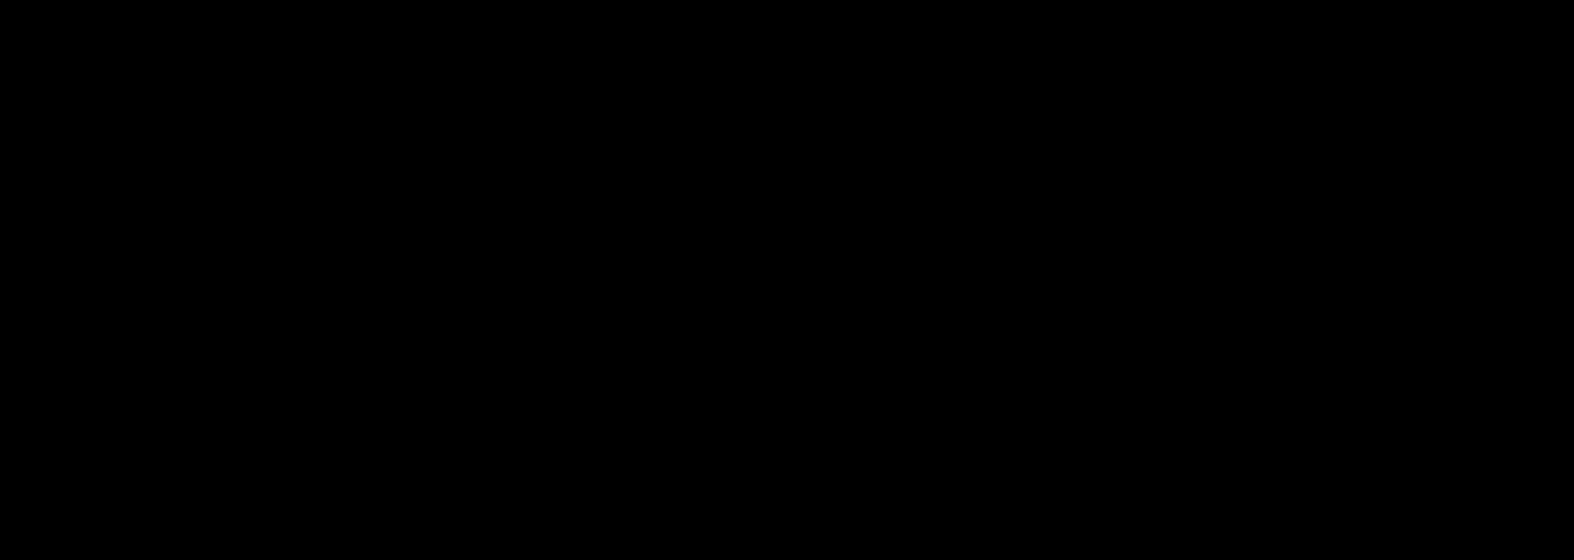 Clorgiline hydrochloride